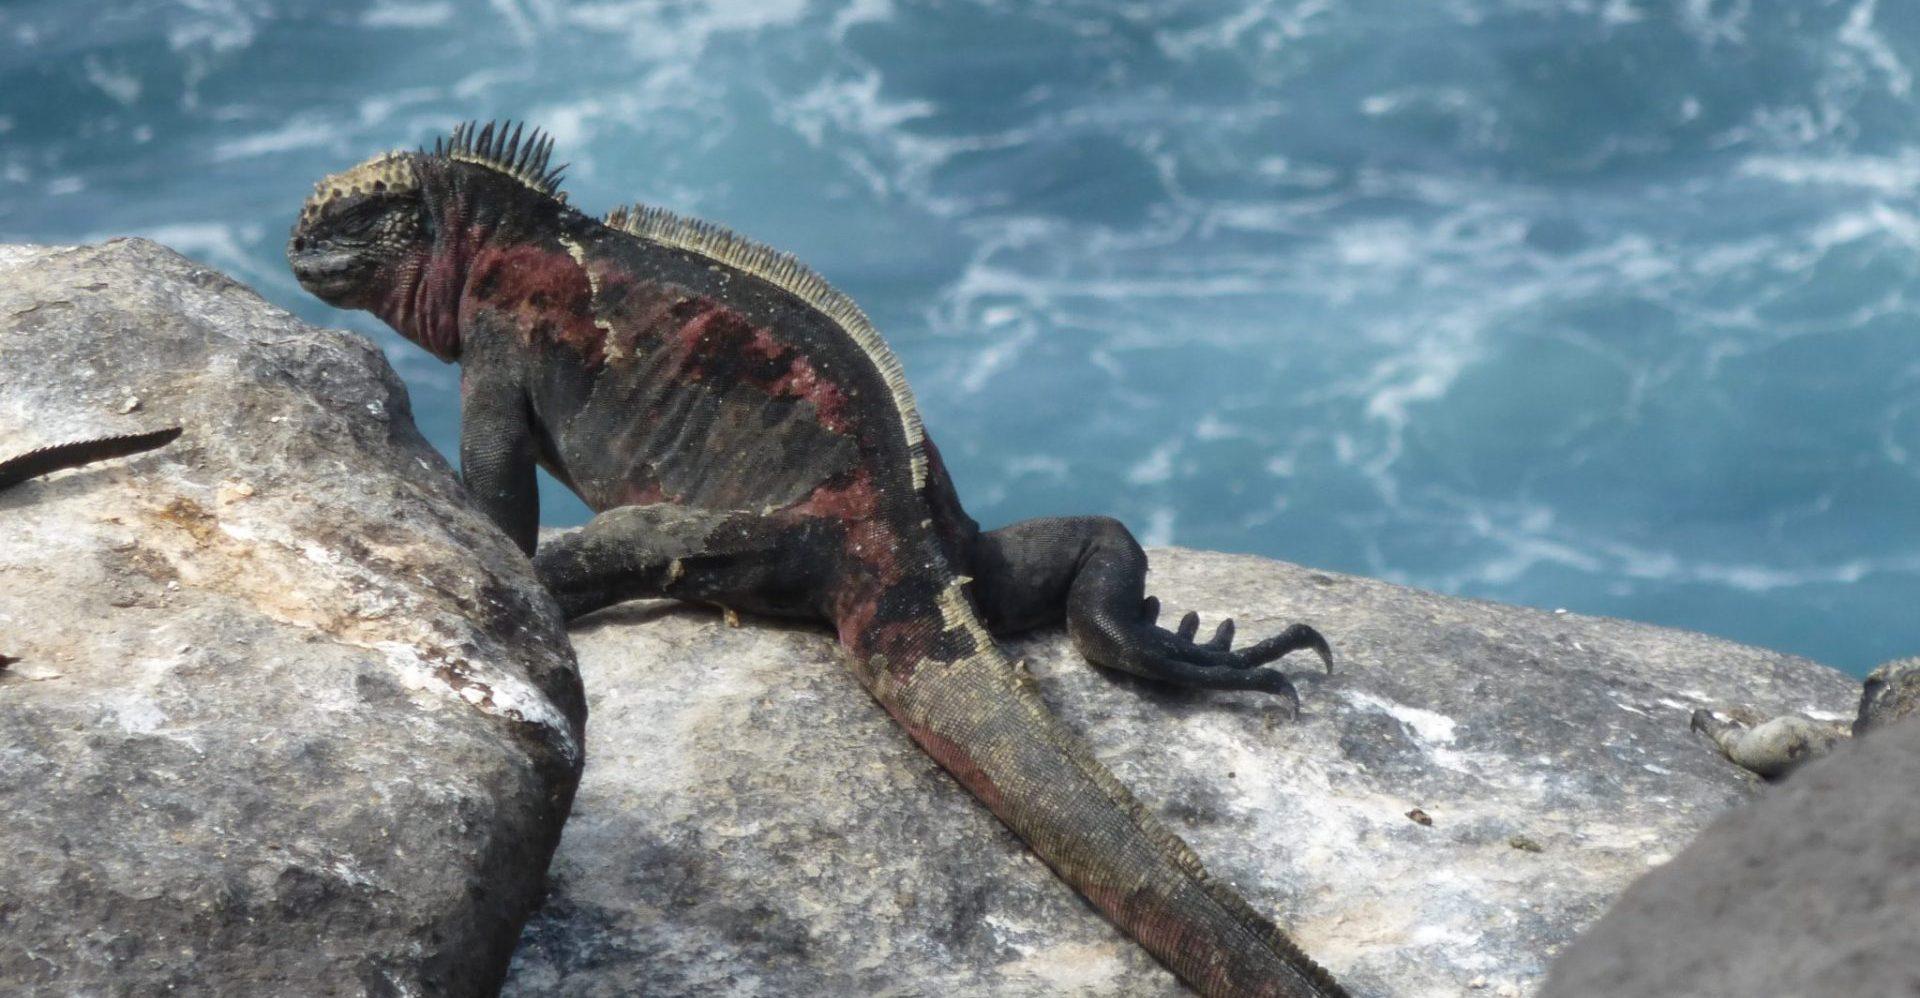 Ecuador, Galapagos, Echse auf Felsen, Latin America Tours, Reisen